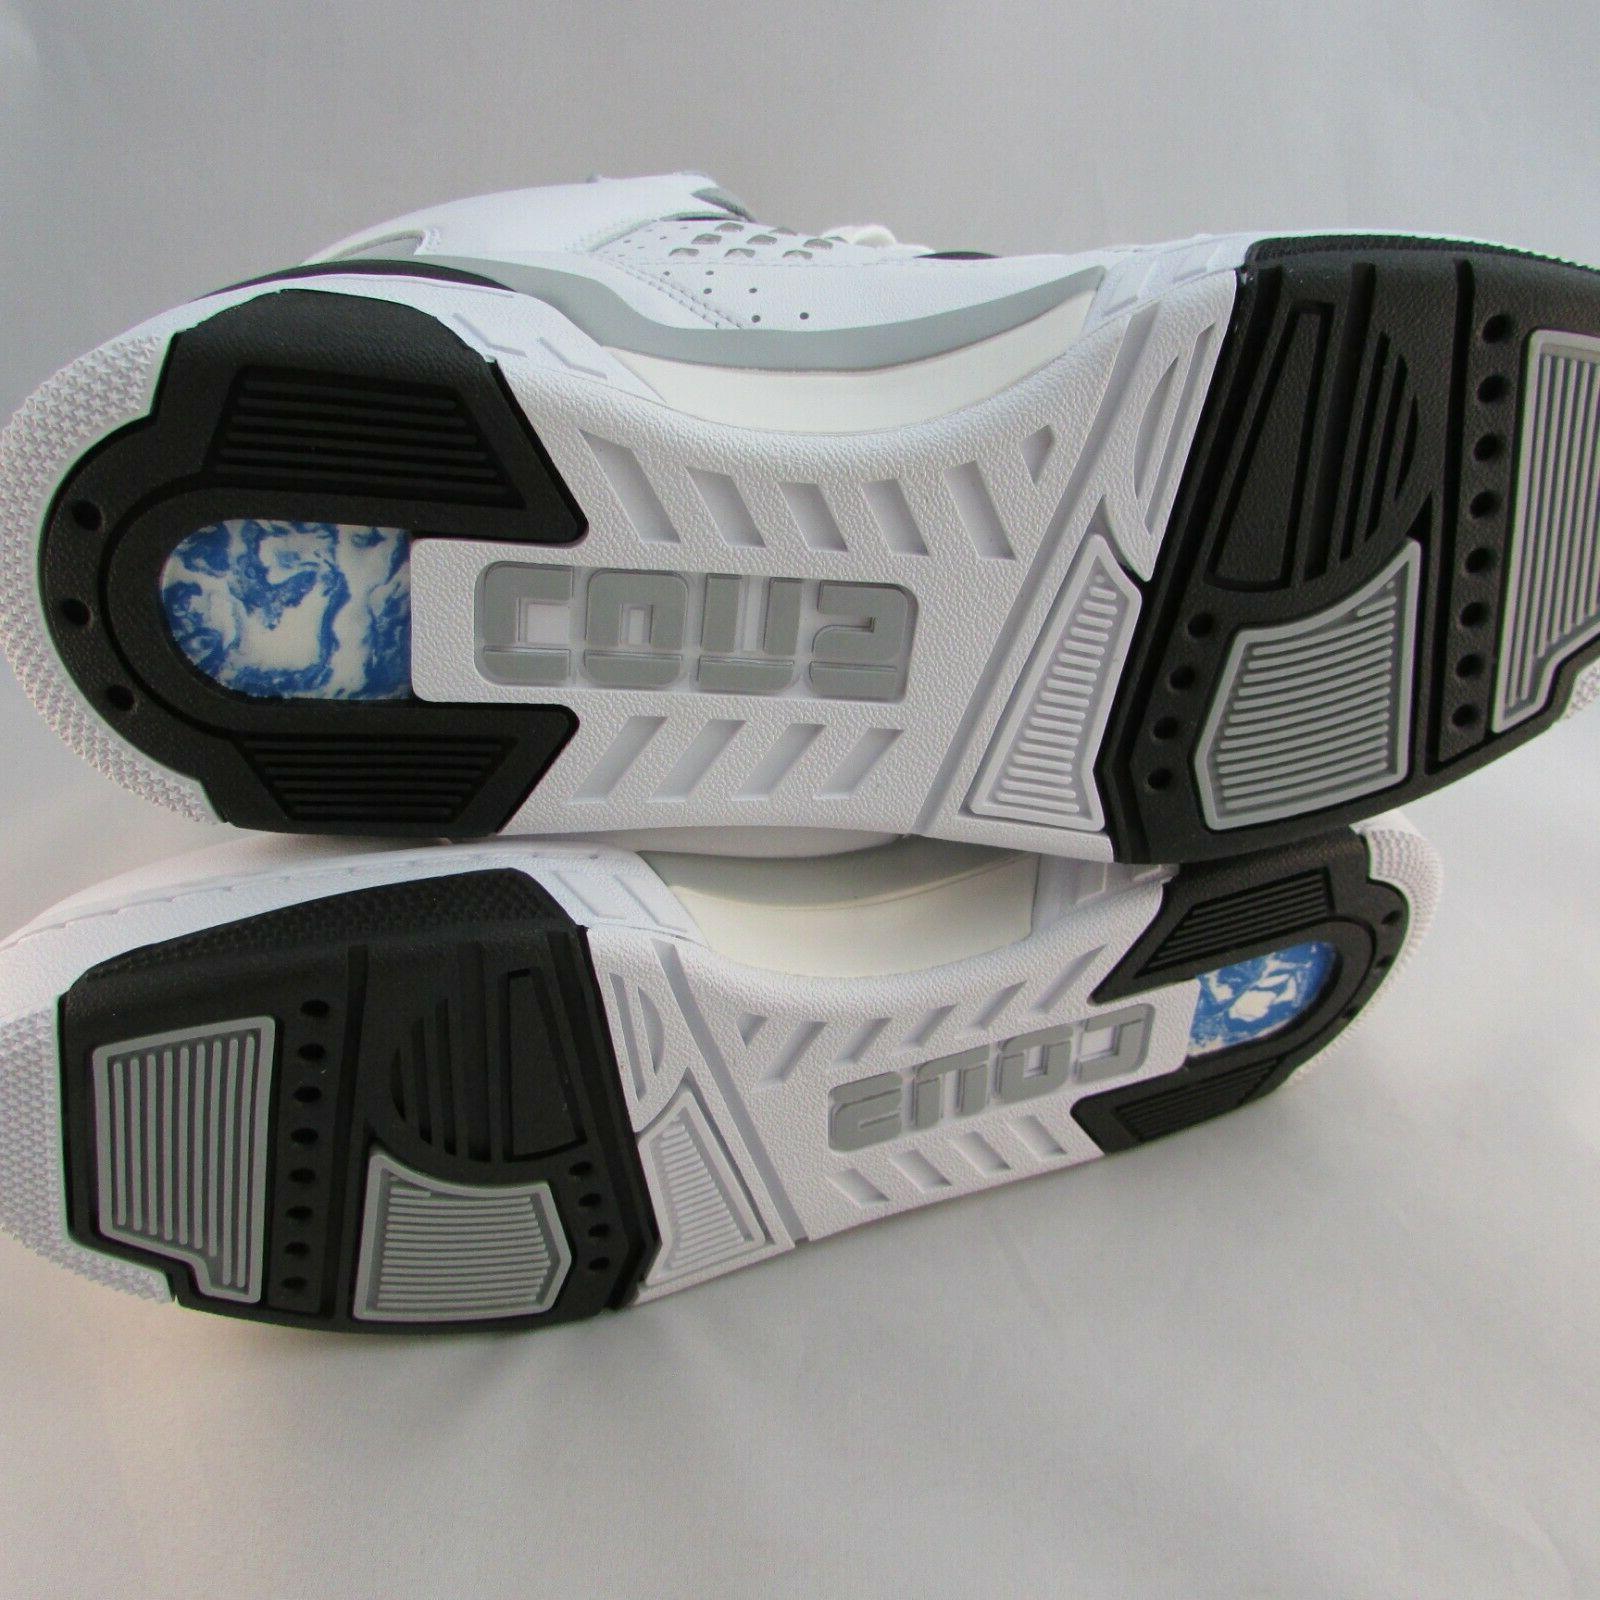 Converse ERX 260 Grey Black 163799C Mens Shoes